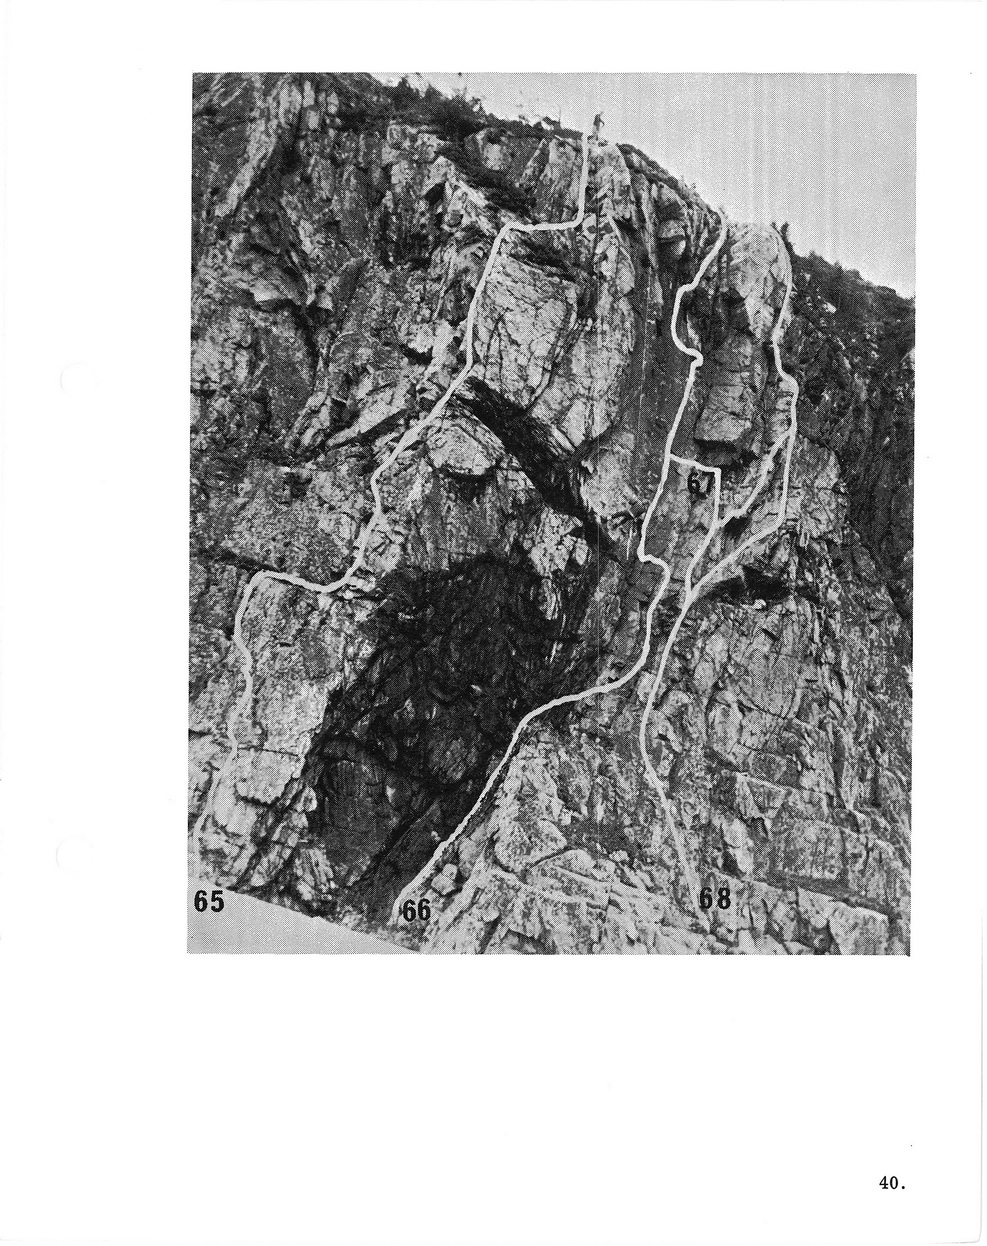 Kullen guide 1972 040.jpg